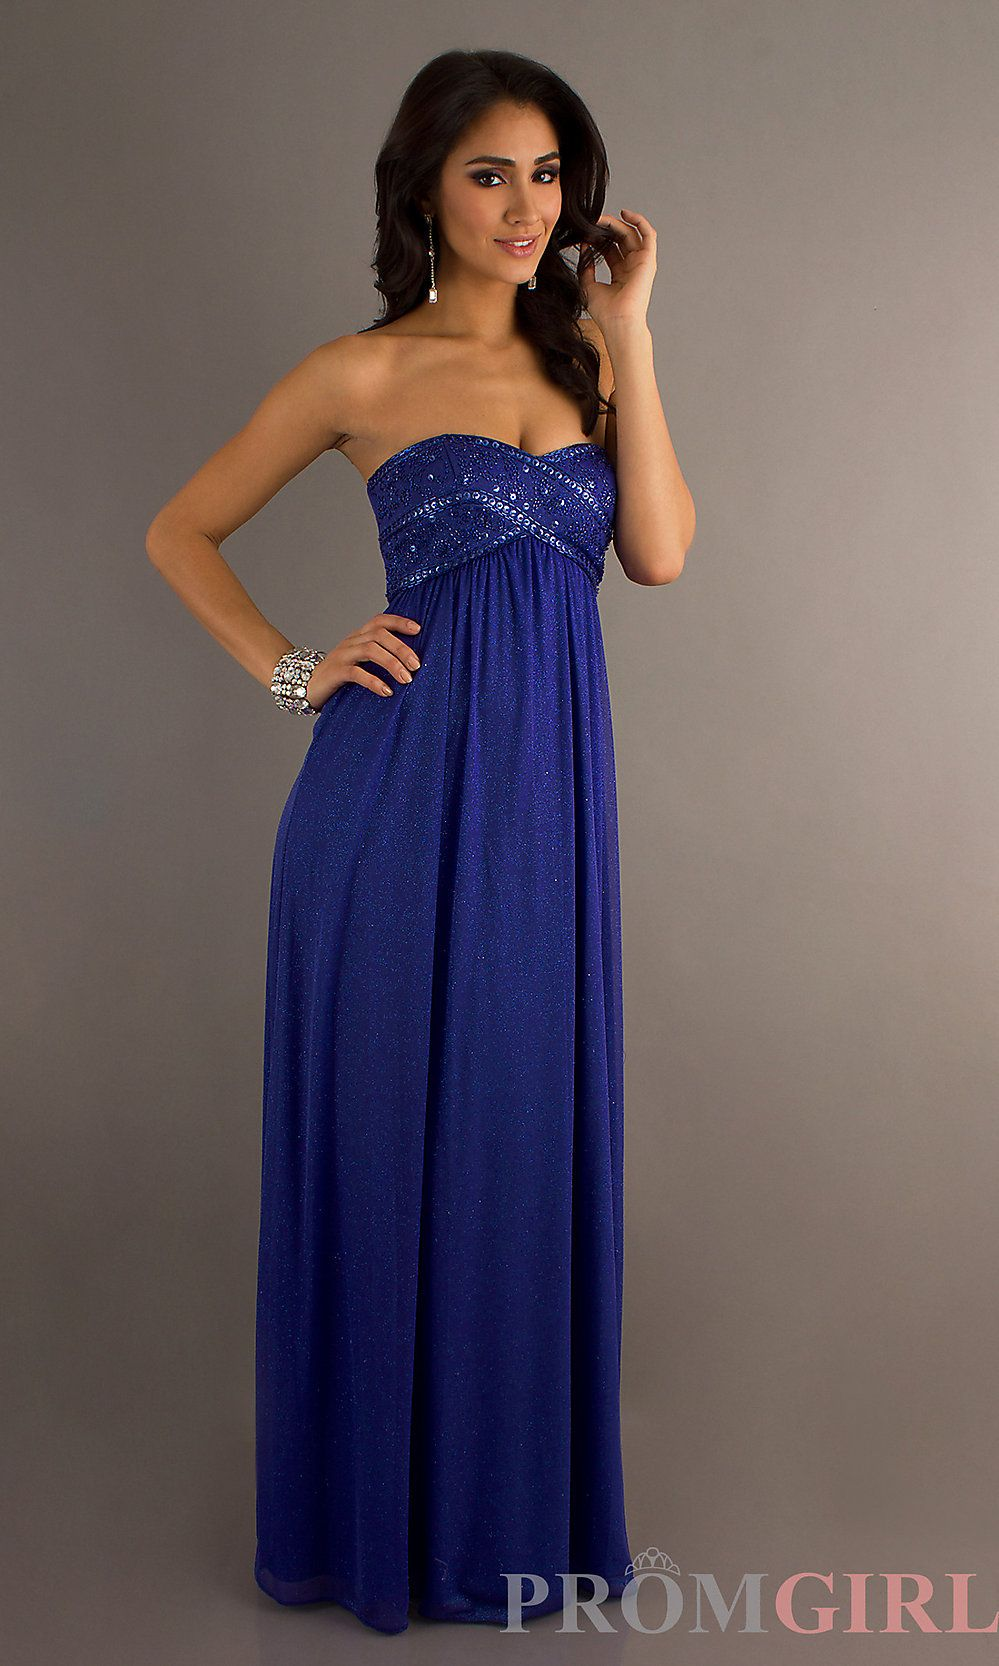 1000  images about dresses on Pinterest  Long prom dresses Blue ...